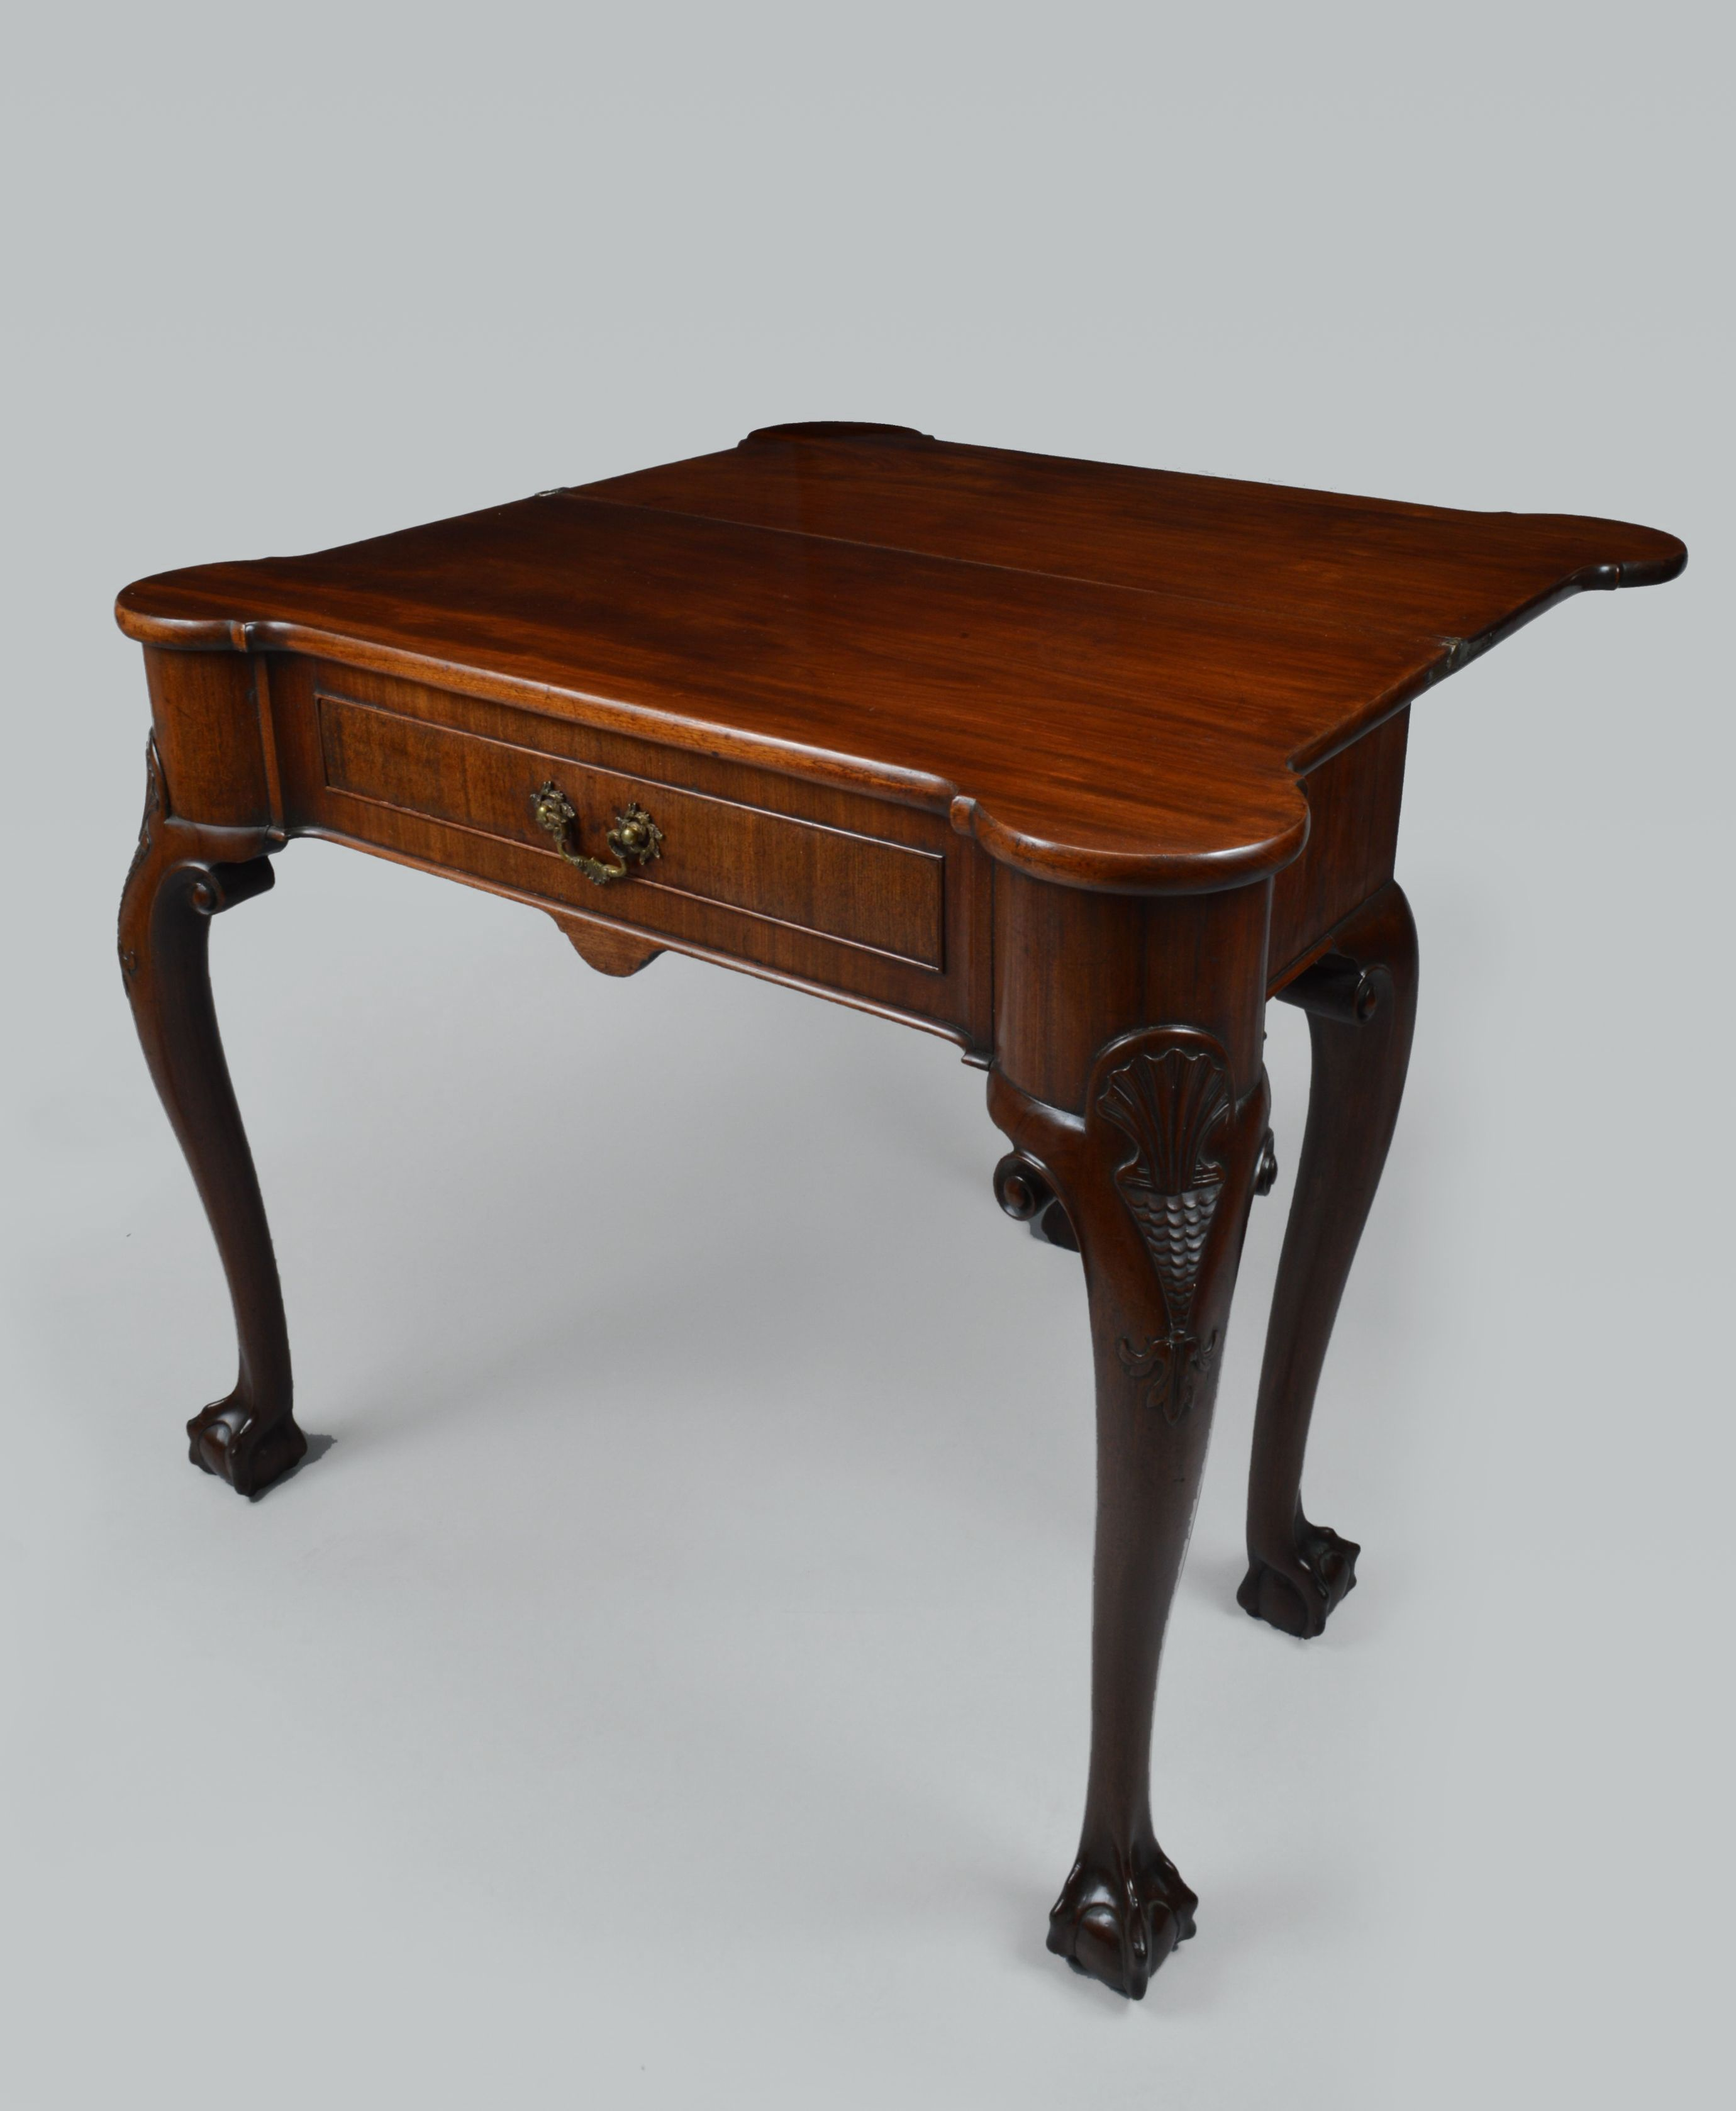 Antique regency mahogany tea table antique card tables uk antique - Antique Tea Table Mahogany Irish Foldover George Iii